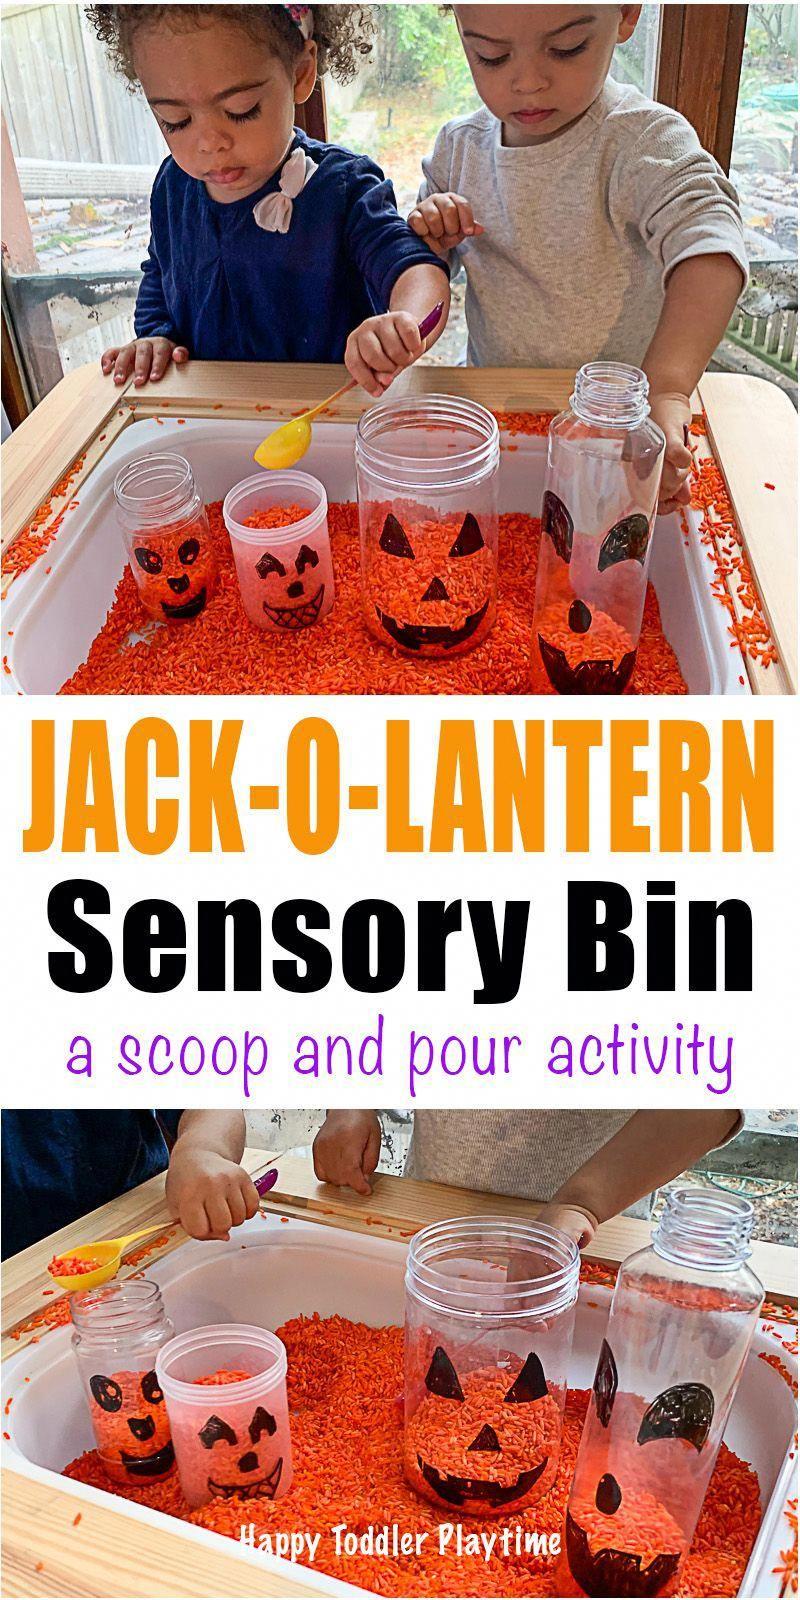 Jack-o-Lantern Sensory Bin for Toddlers – HAPPY TODDLER PLAYTIME